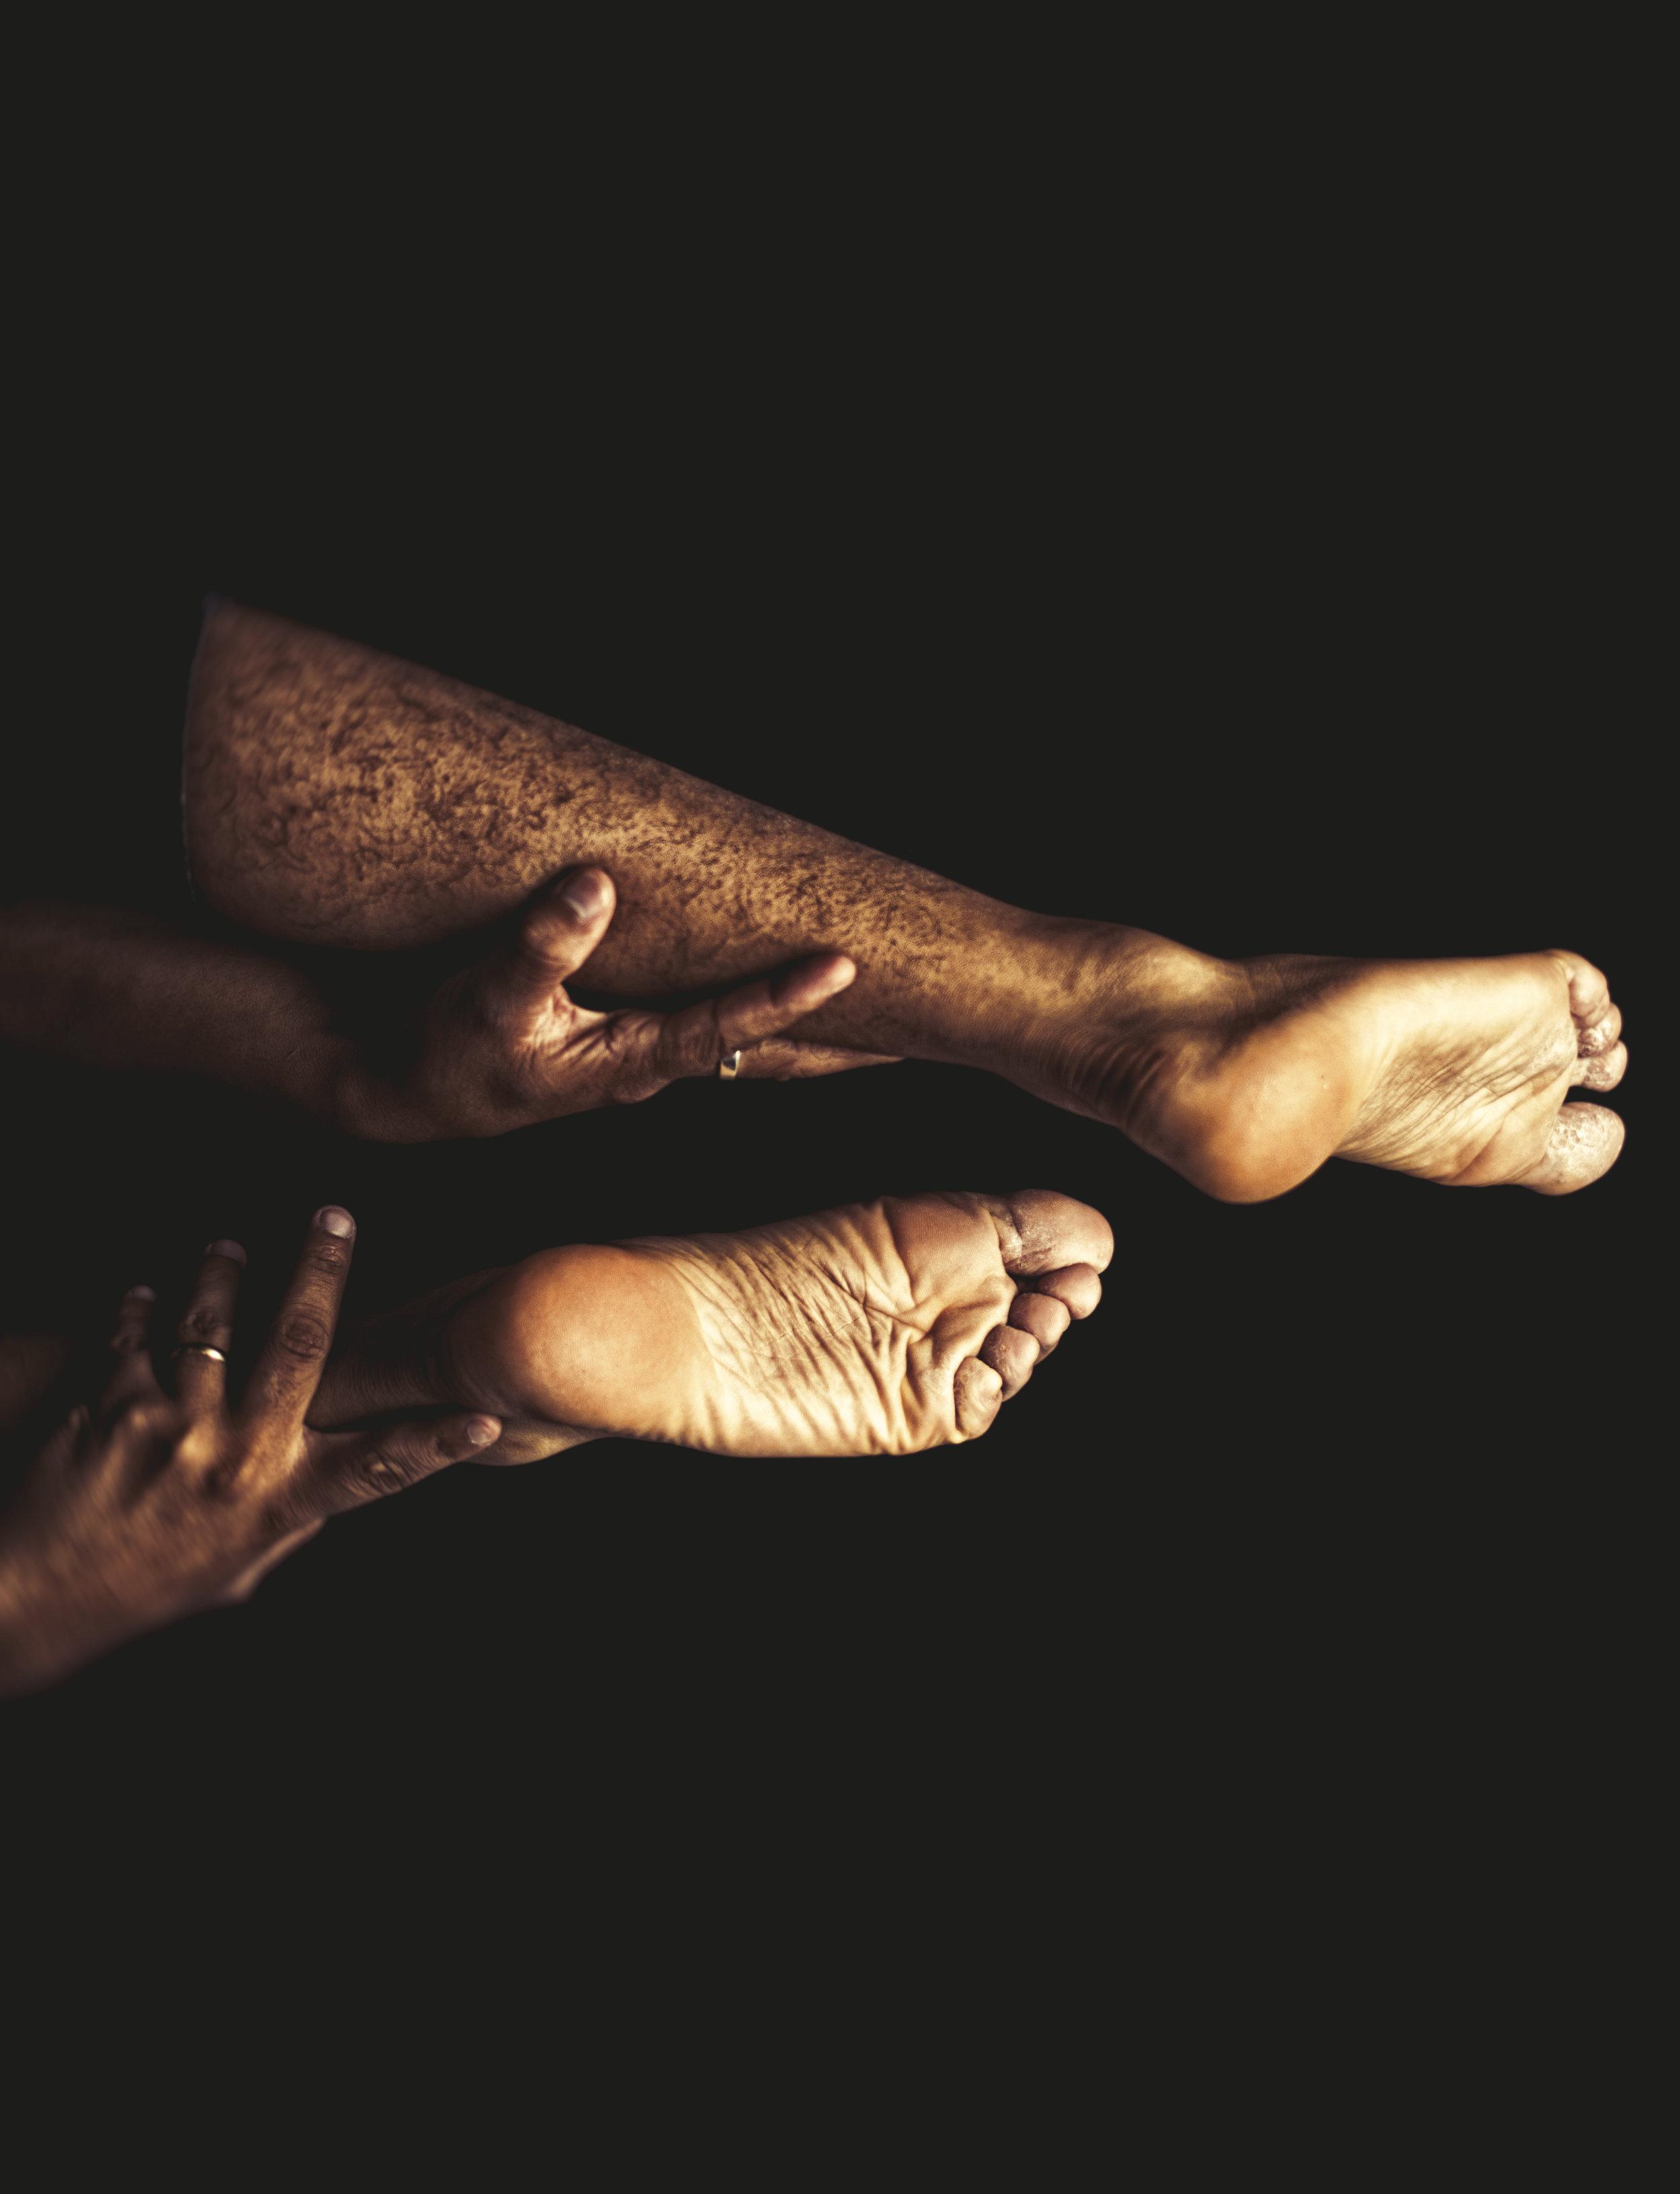 feet-1842328_1920.jpg